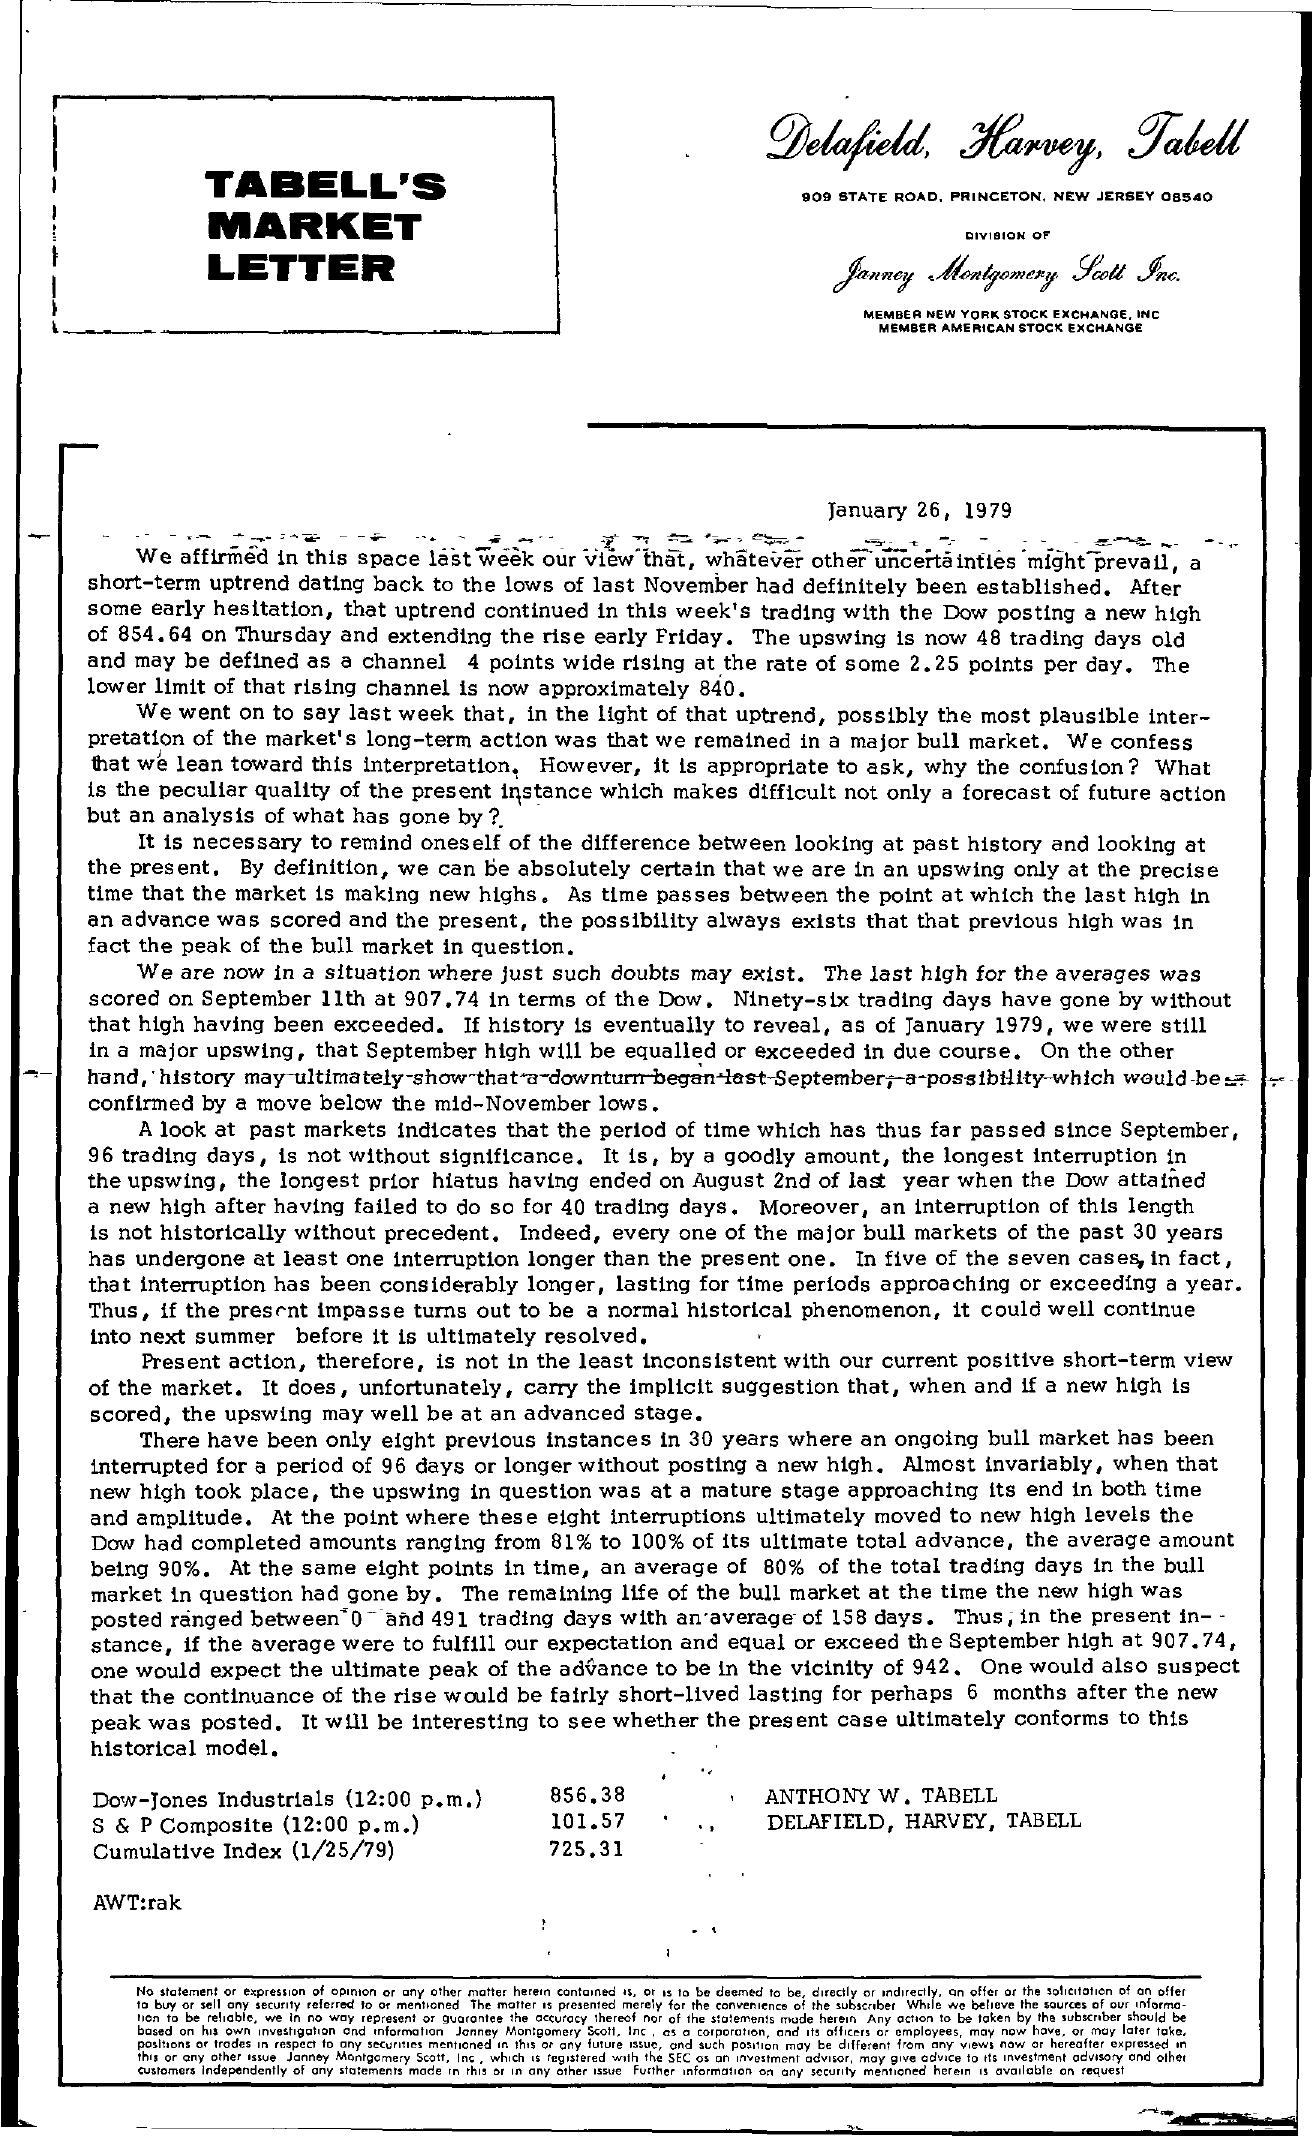 Tabell's Market Letter - January 26, 1979